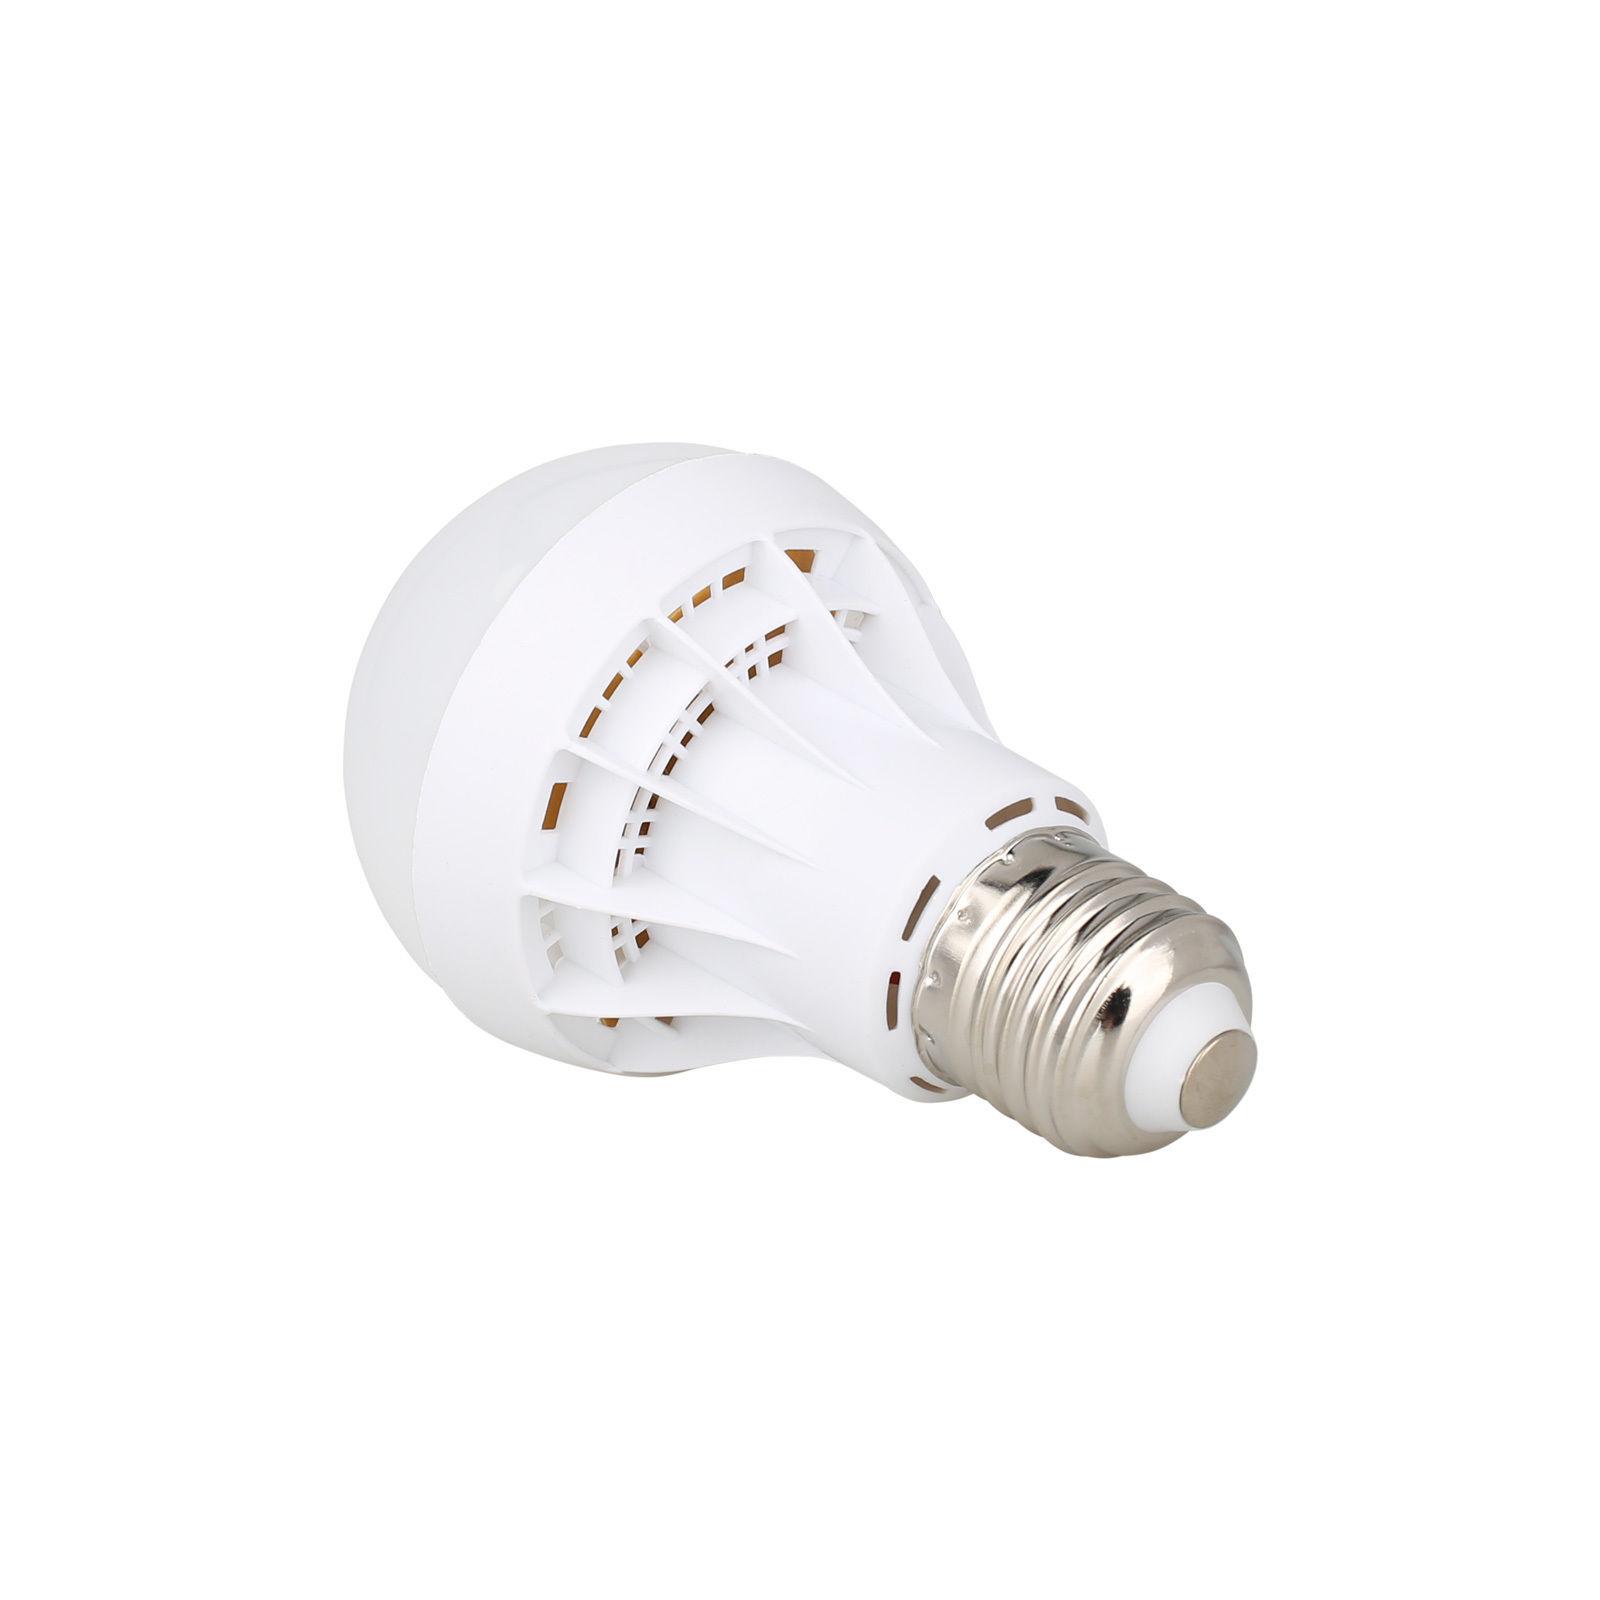 LED E27 Energy Saving Bulb Light 3W  Globe Lamp  220V Warm White